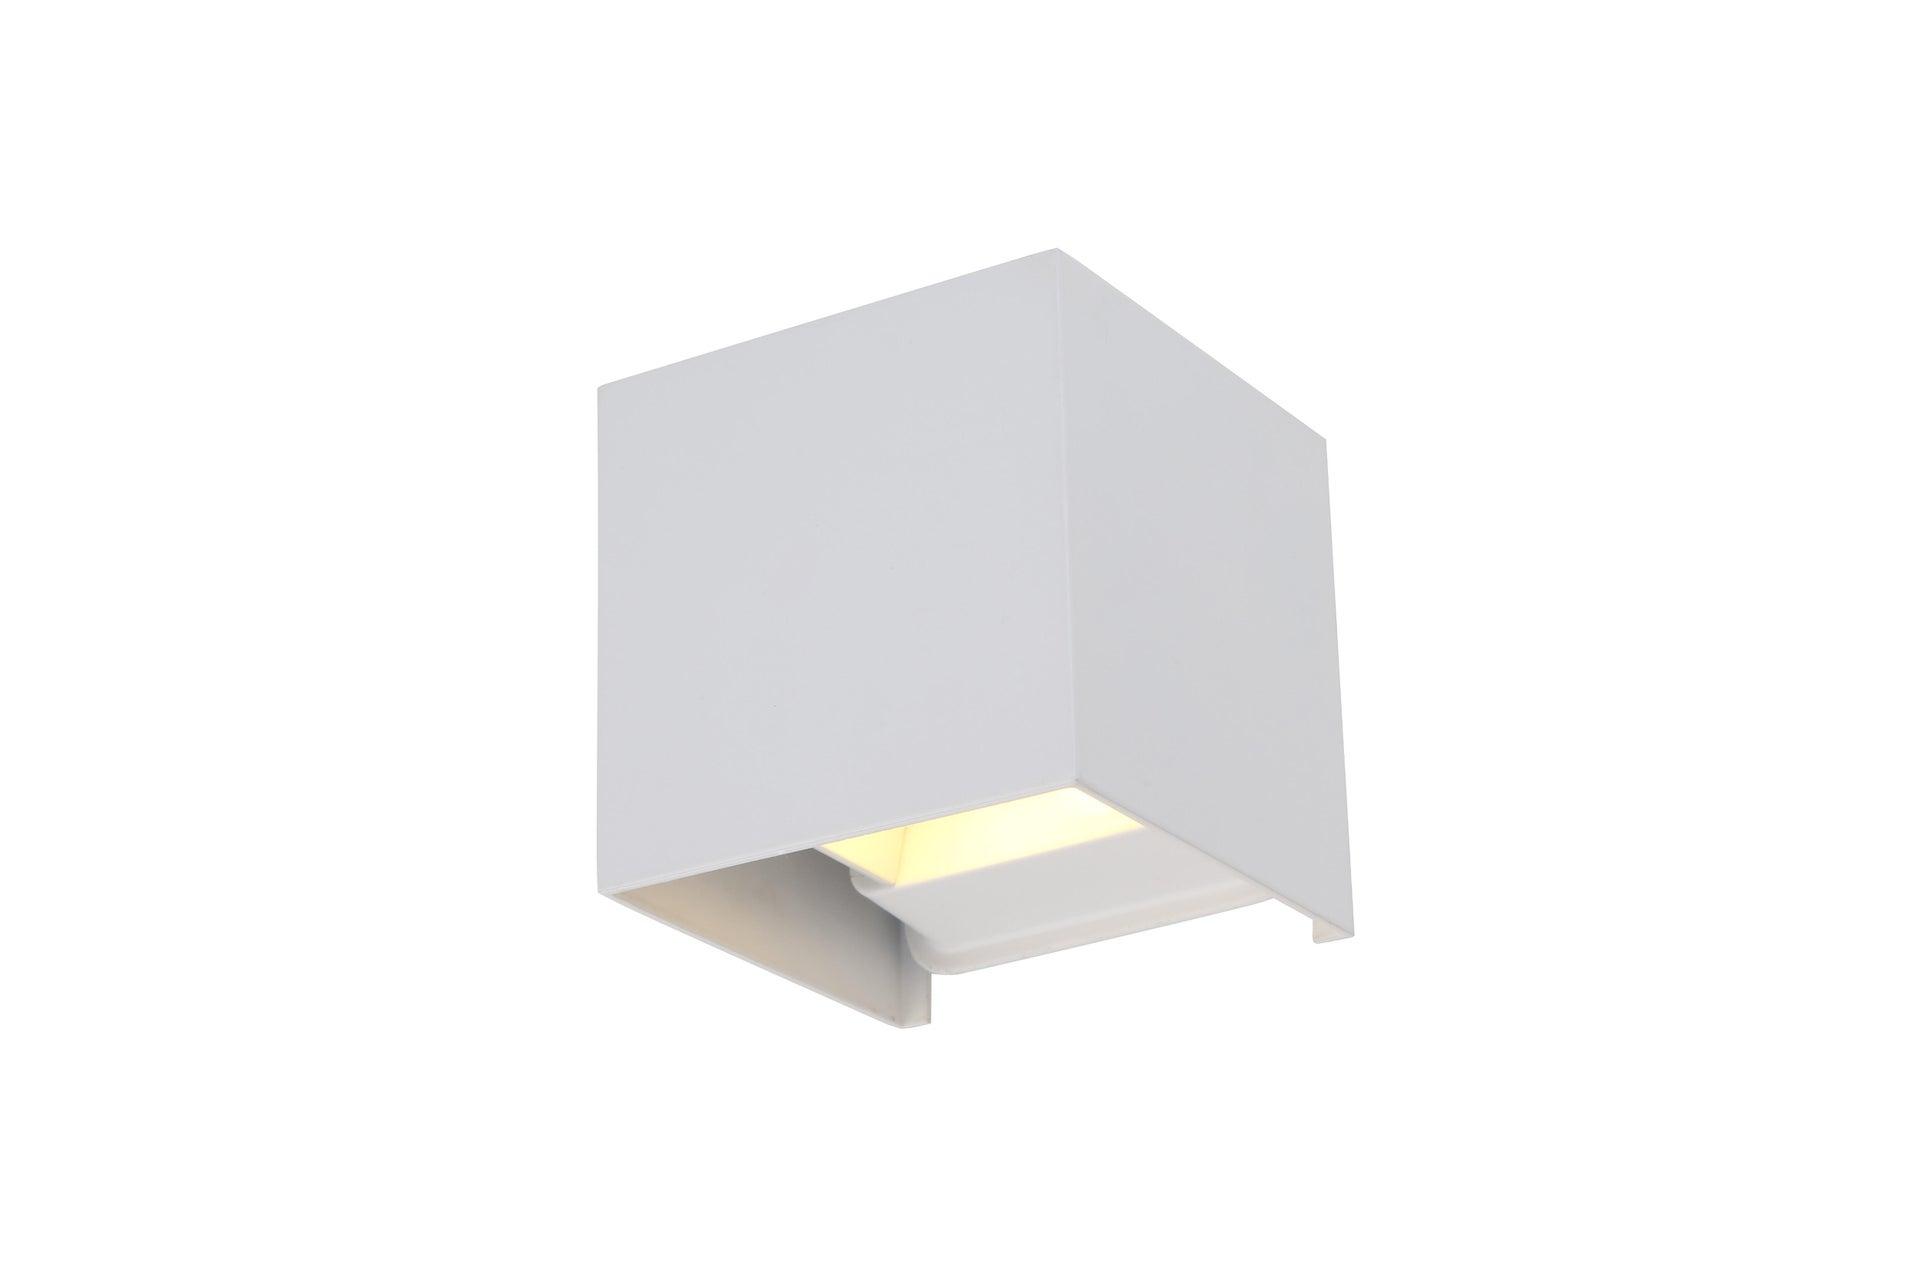 Applique design Kubbo LED integrato bianco, in alluminio, D. 10.0 cm 10.0x10.0 cm, INSPIRE - 5